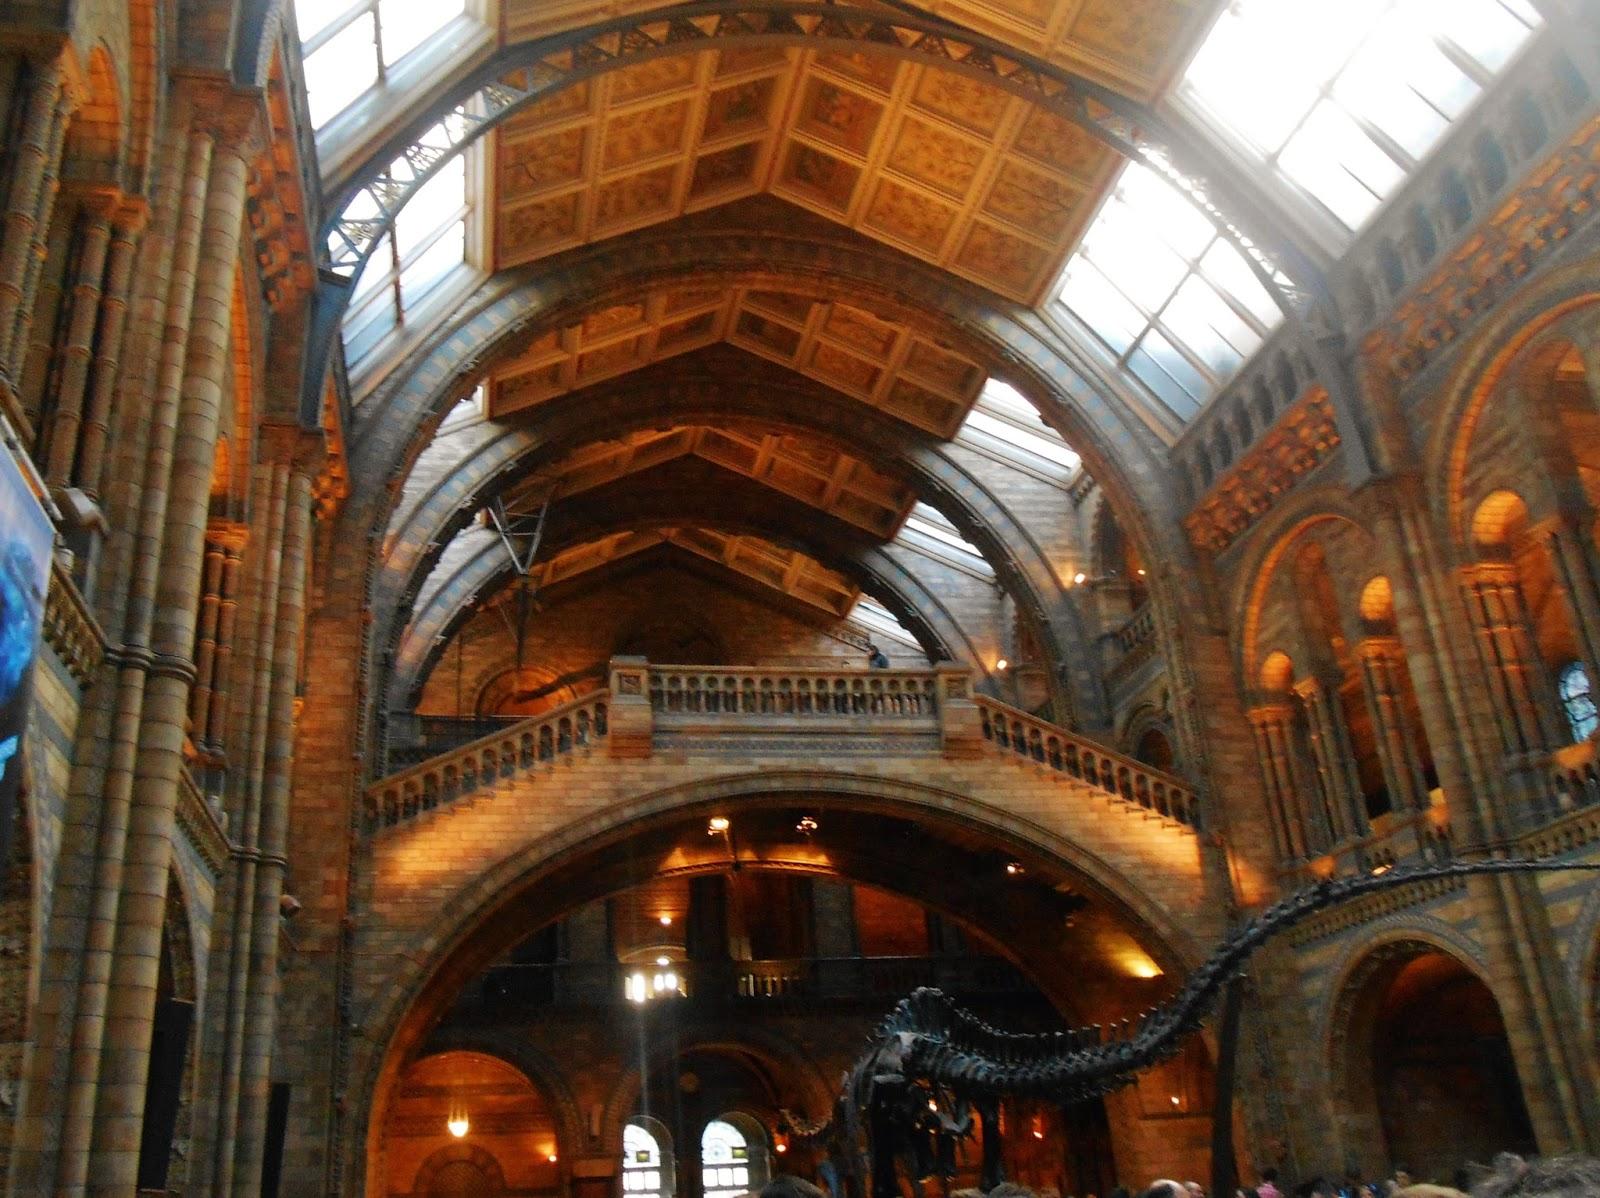 Dinozaur w Muzeum Historii Naturalnej.